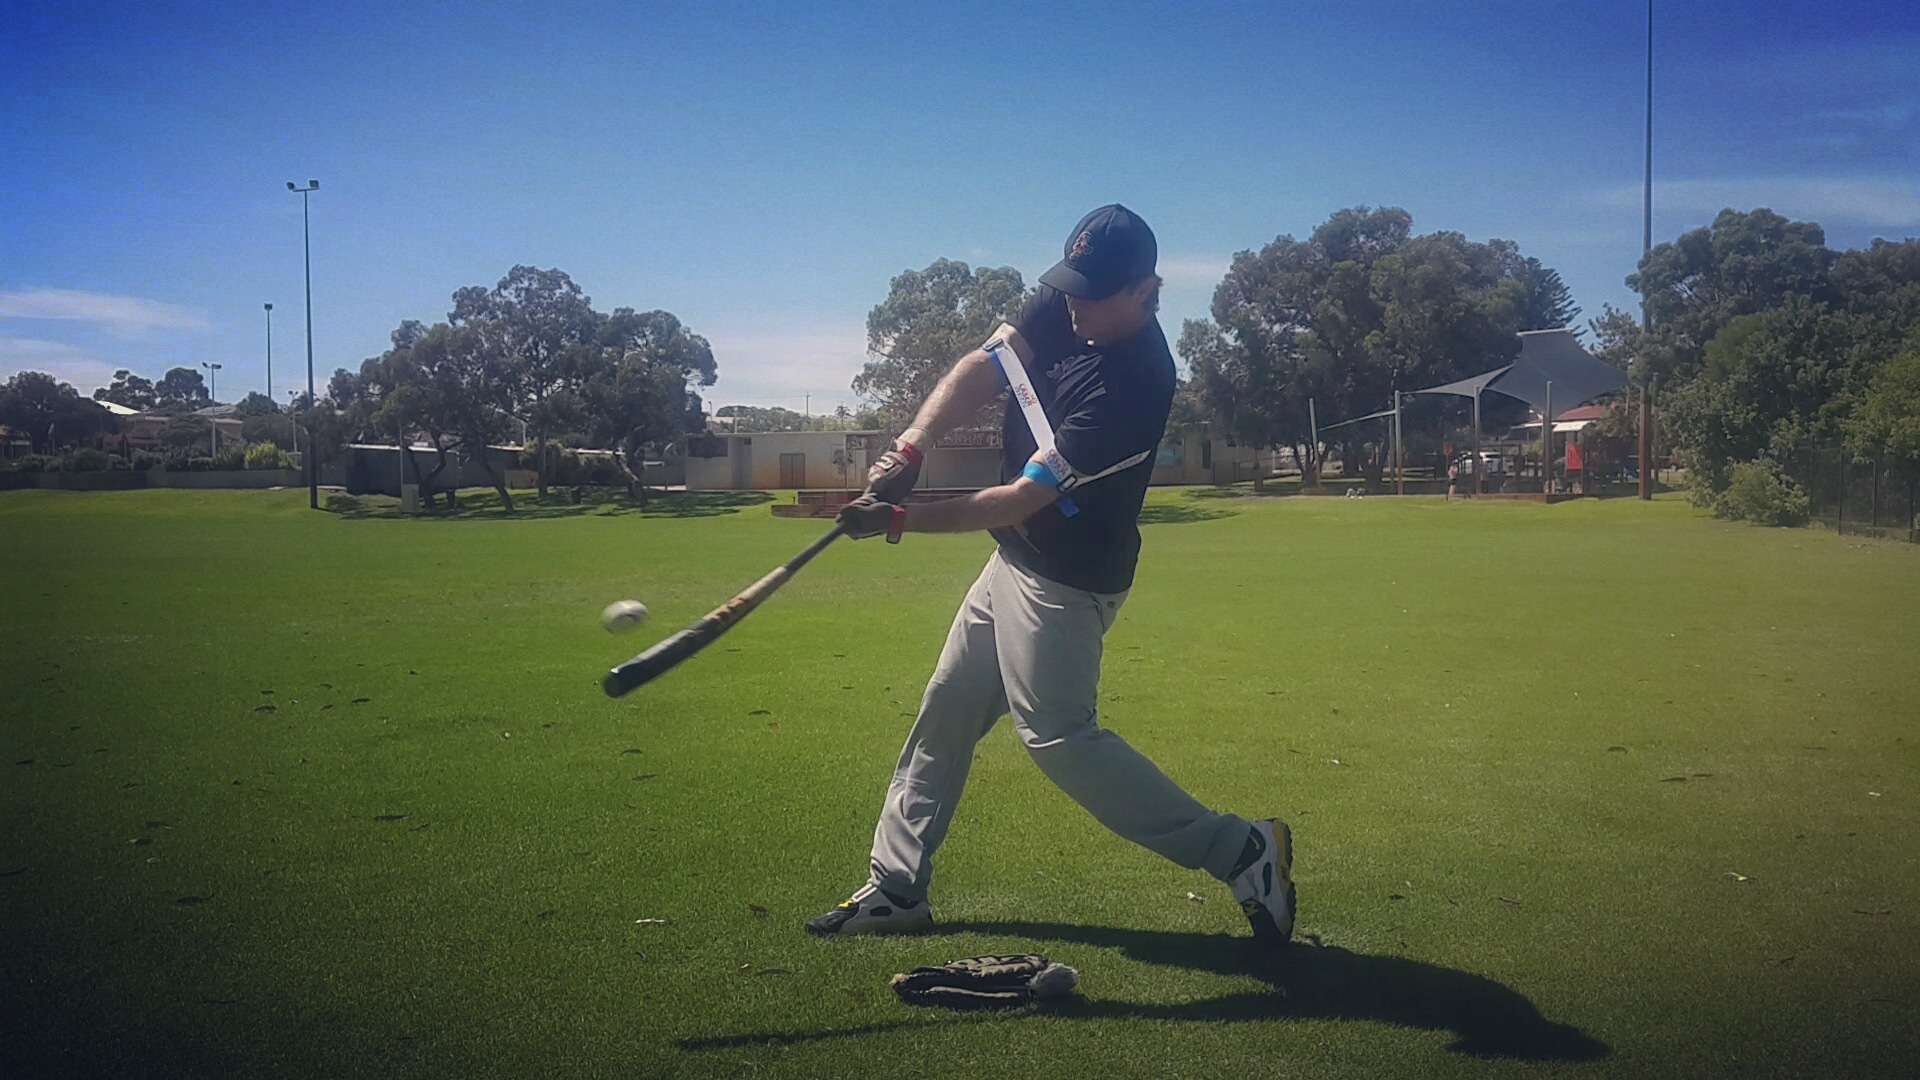 Bat Speed Booster (Multi-Swing Method)